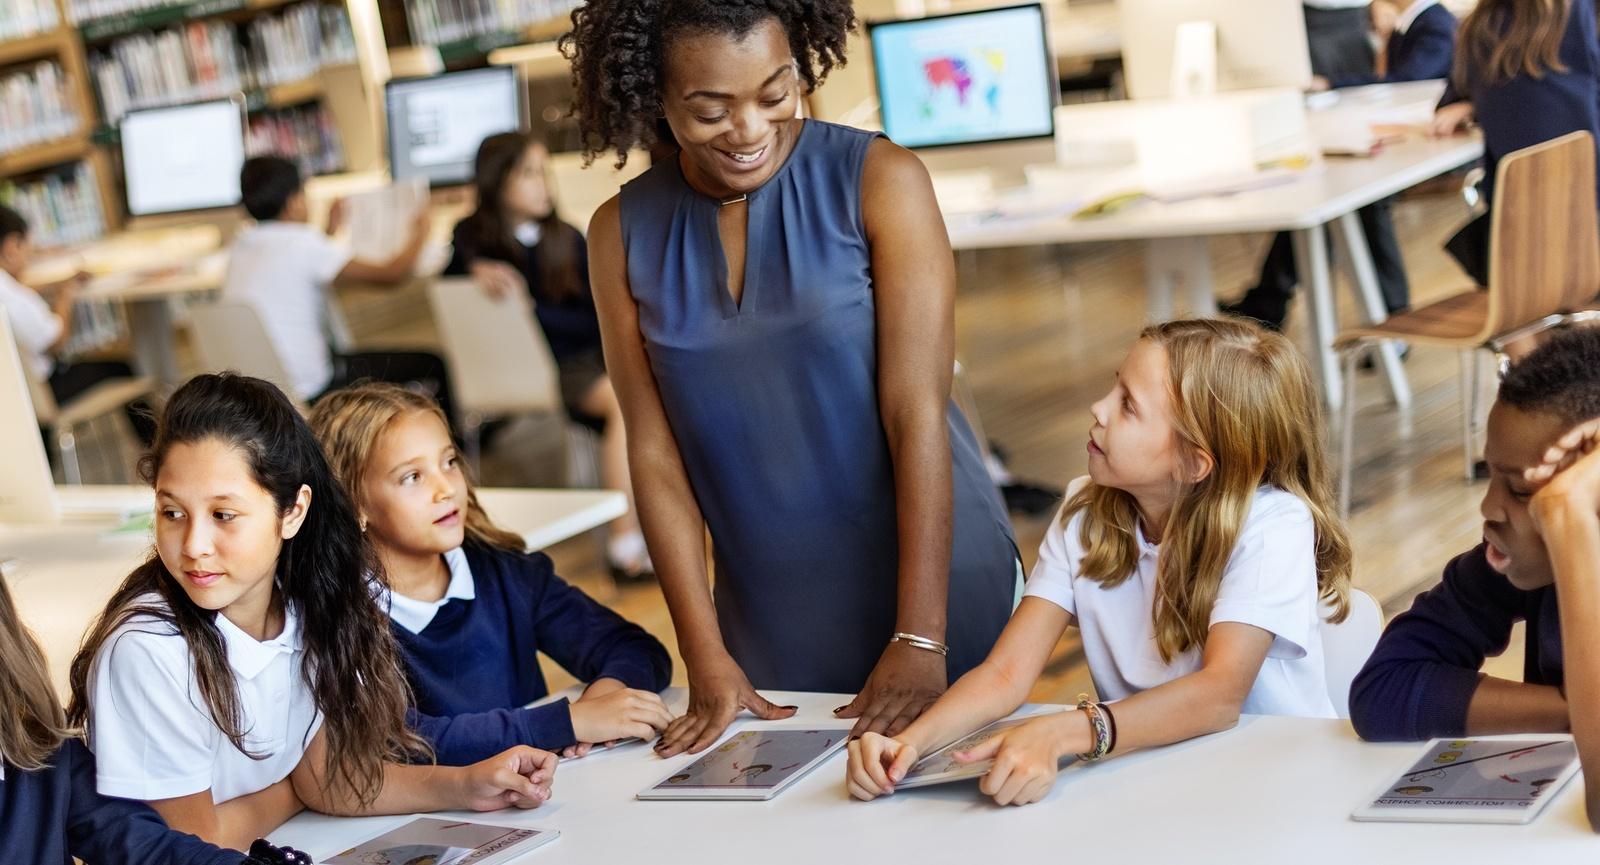 bigstock-Education-School-Teacher-Stude-125278622.jpg